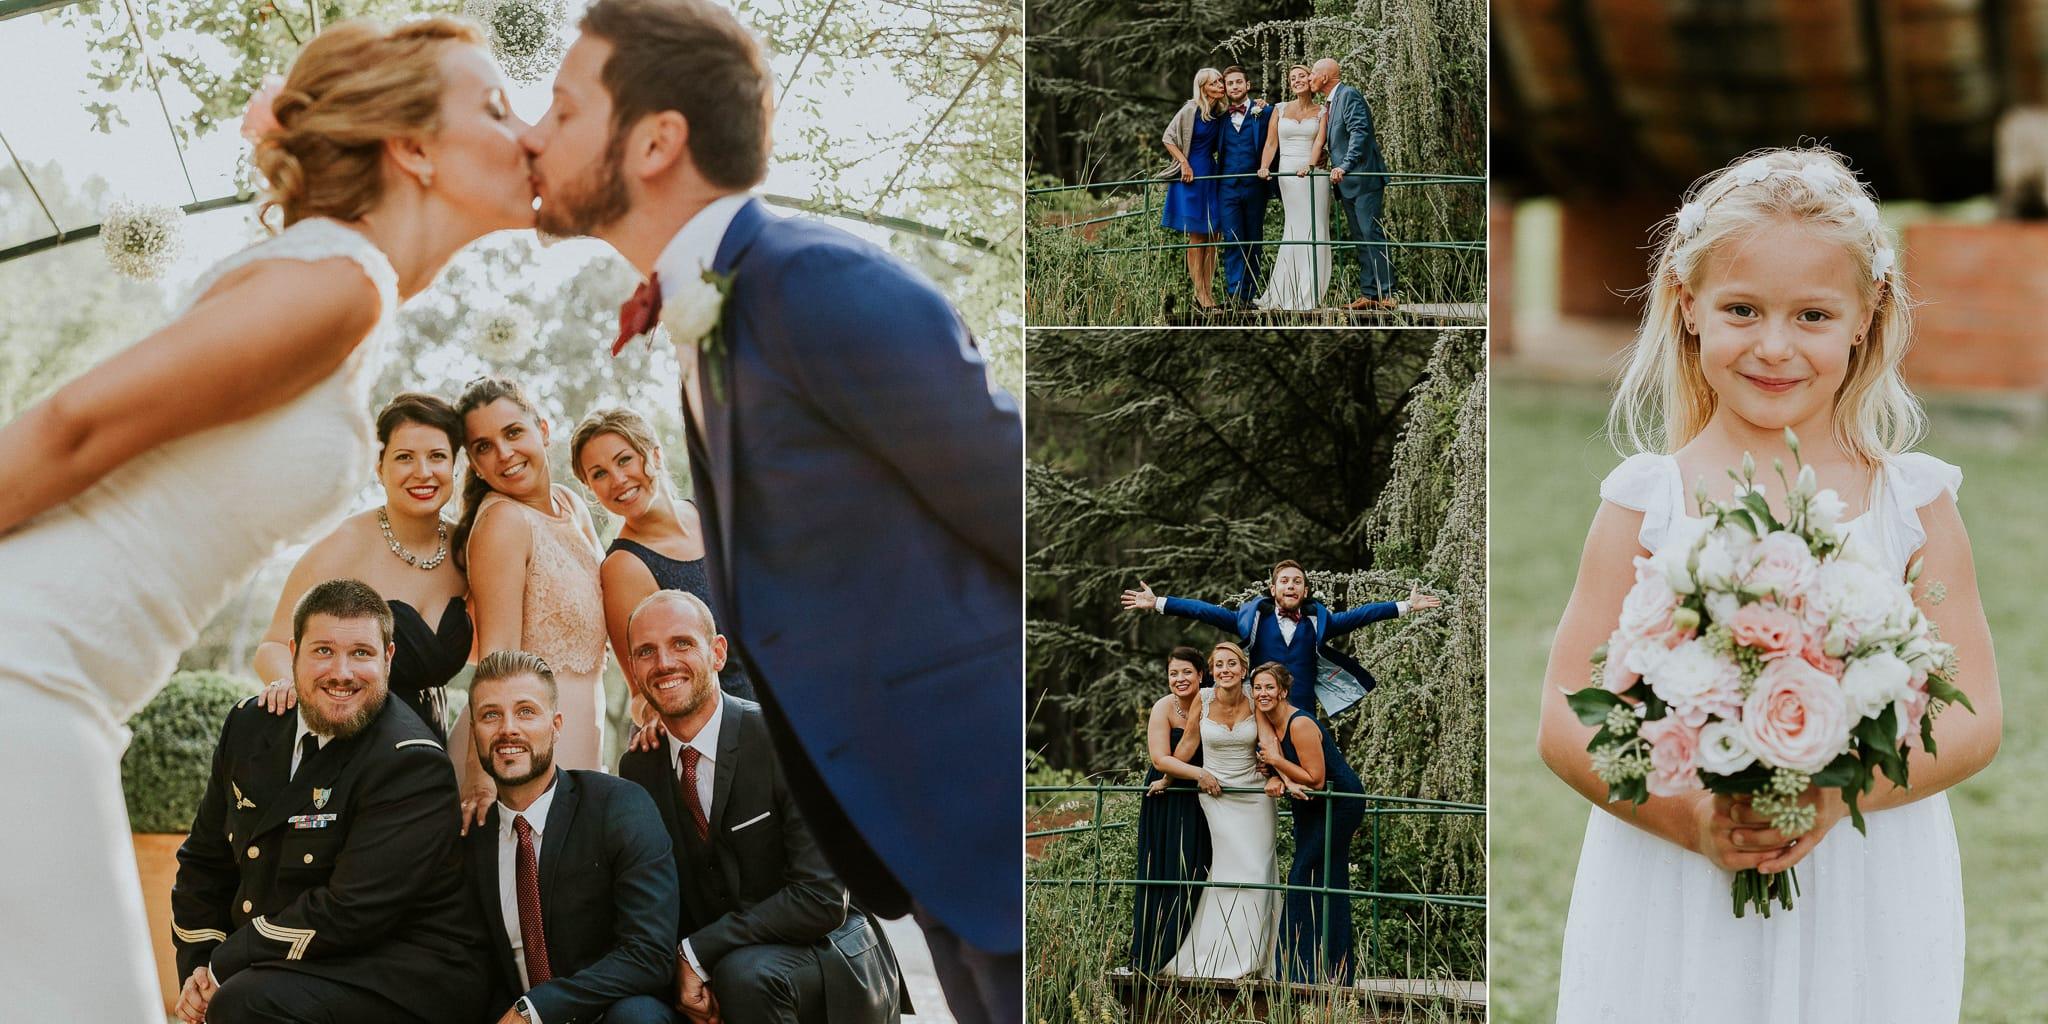 Costi-Moiceanu-Photographer-CM-Photography-Wedding-Mariage-French-Riviera-Cote-D-Azur-Alpes-Maritimes-Weding-Album-Design-14